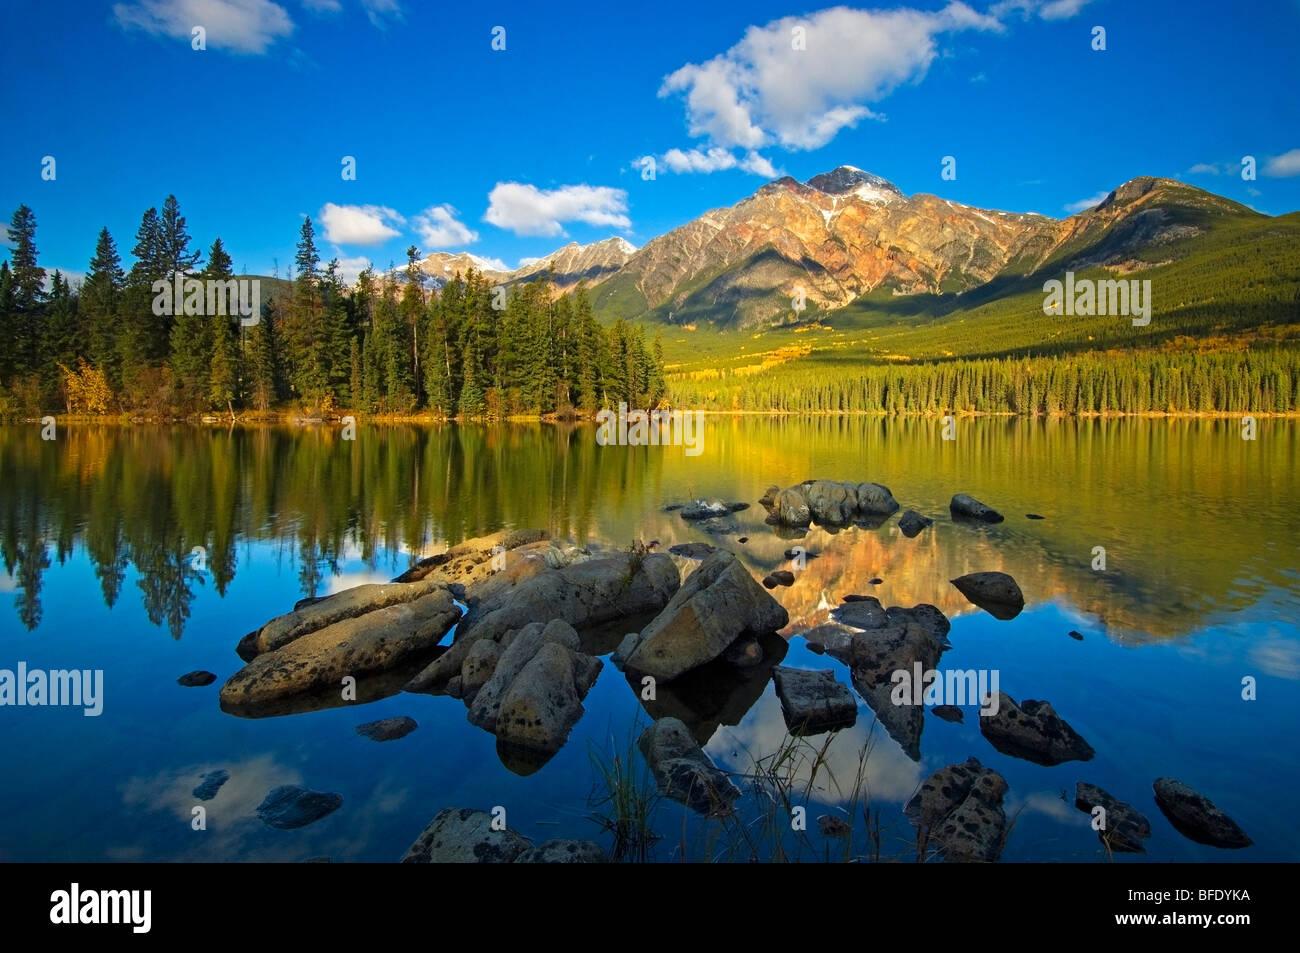 La montagne pyramide reflète dans Pyramid Lake dans le parc national Jasper, Alberta, Canada Photo Stock